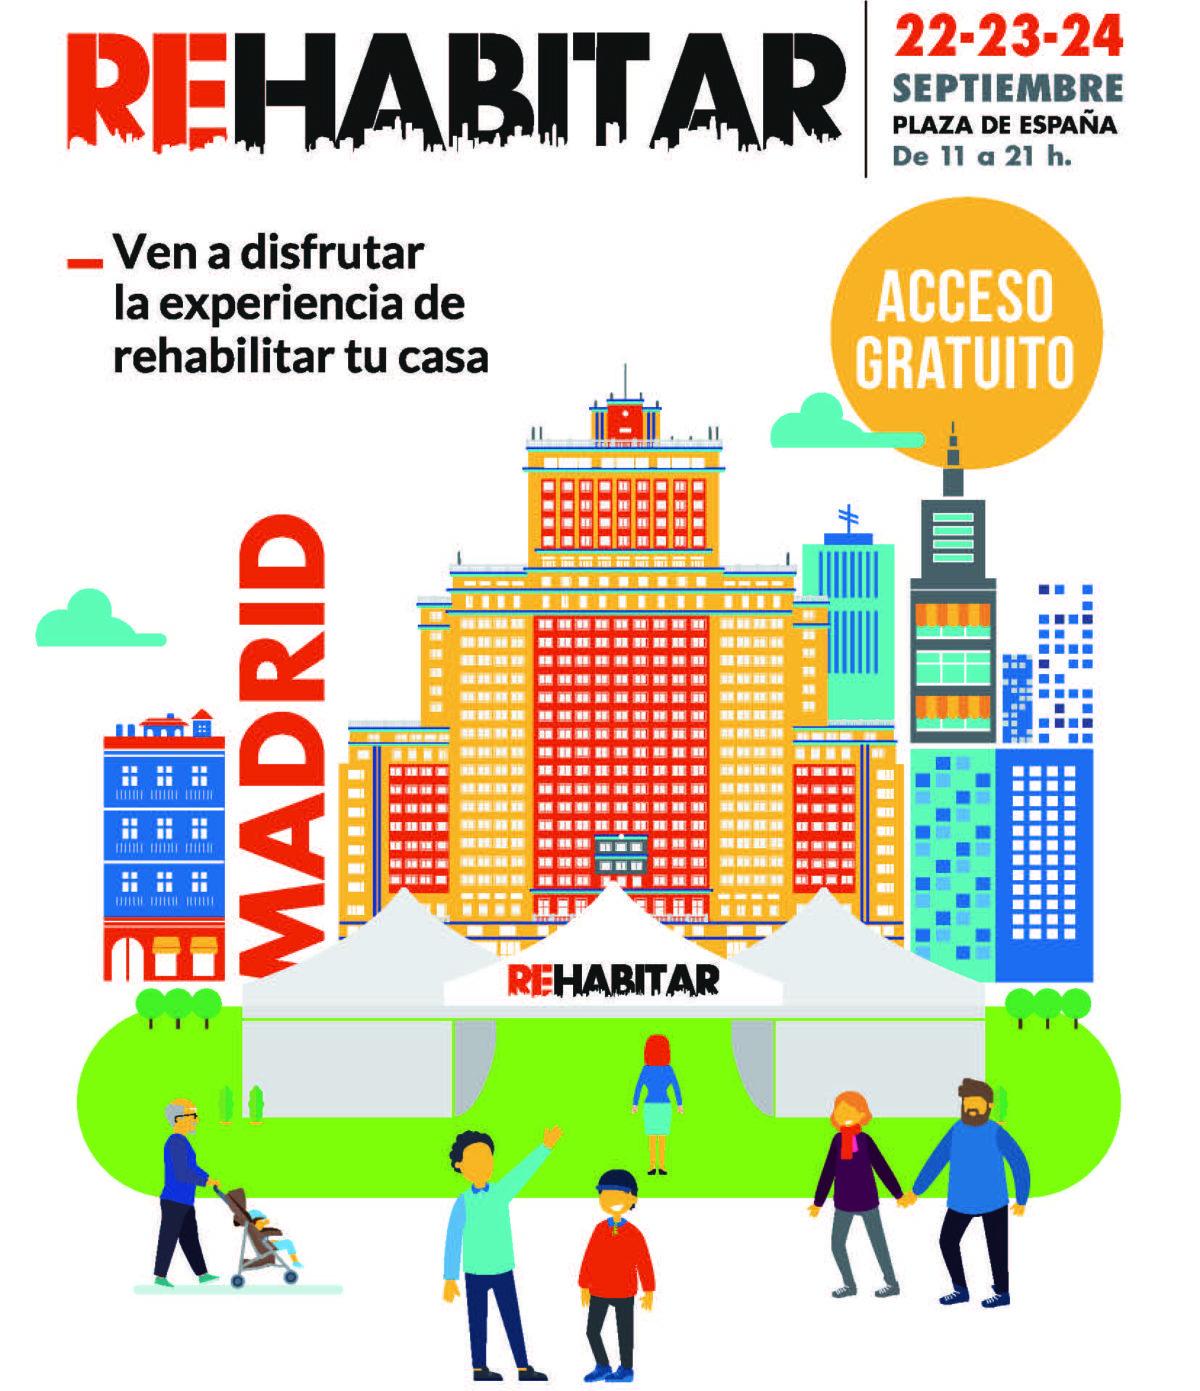 El sistema Sate Rhonatherm en Feria Rehabitar Madrid